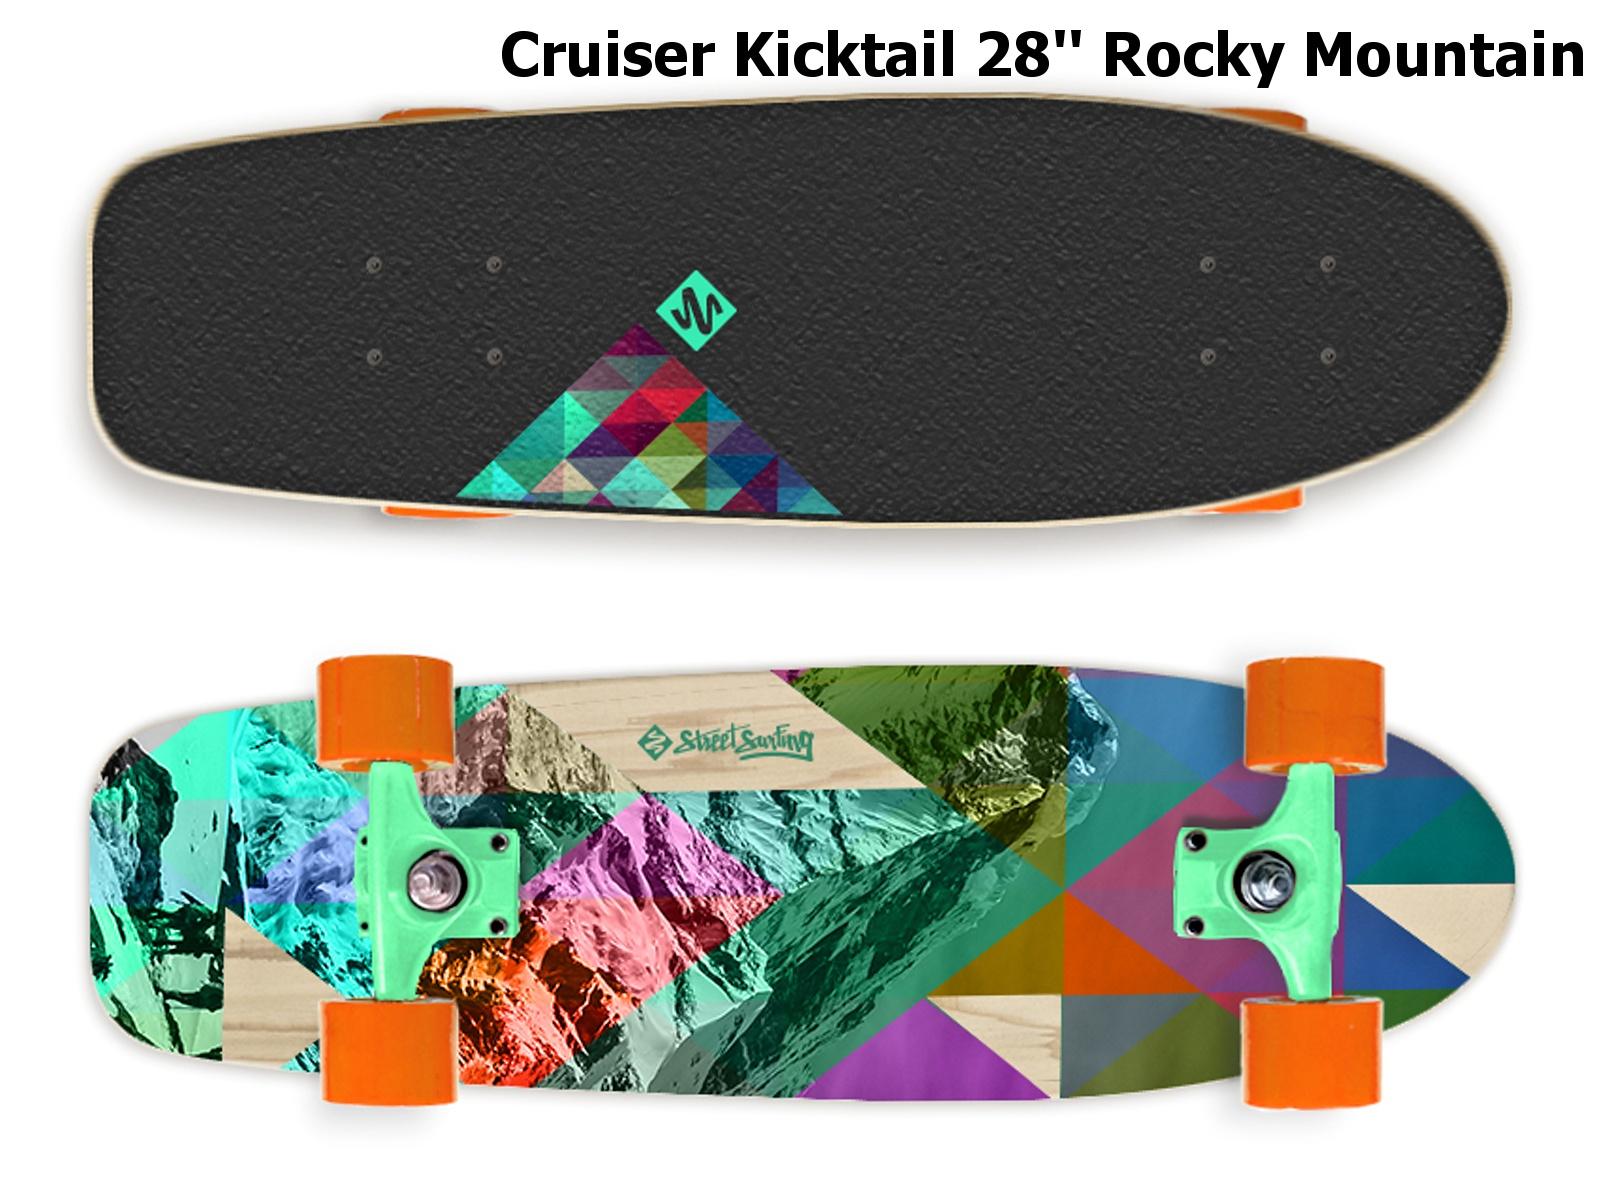 Skateboard STREET SURFING Cruiser Kicktail 28 Rocky Mountain